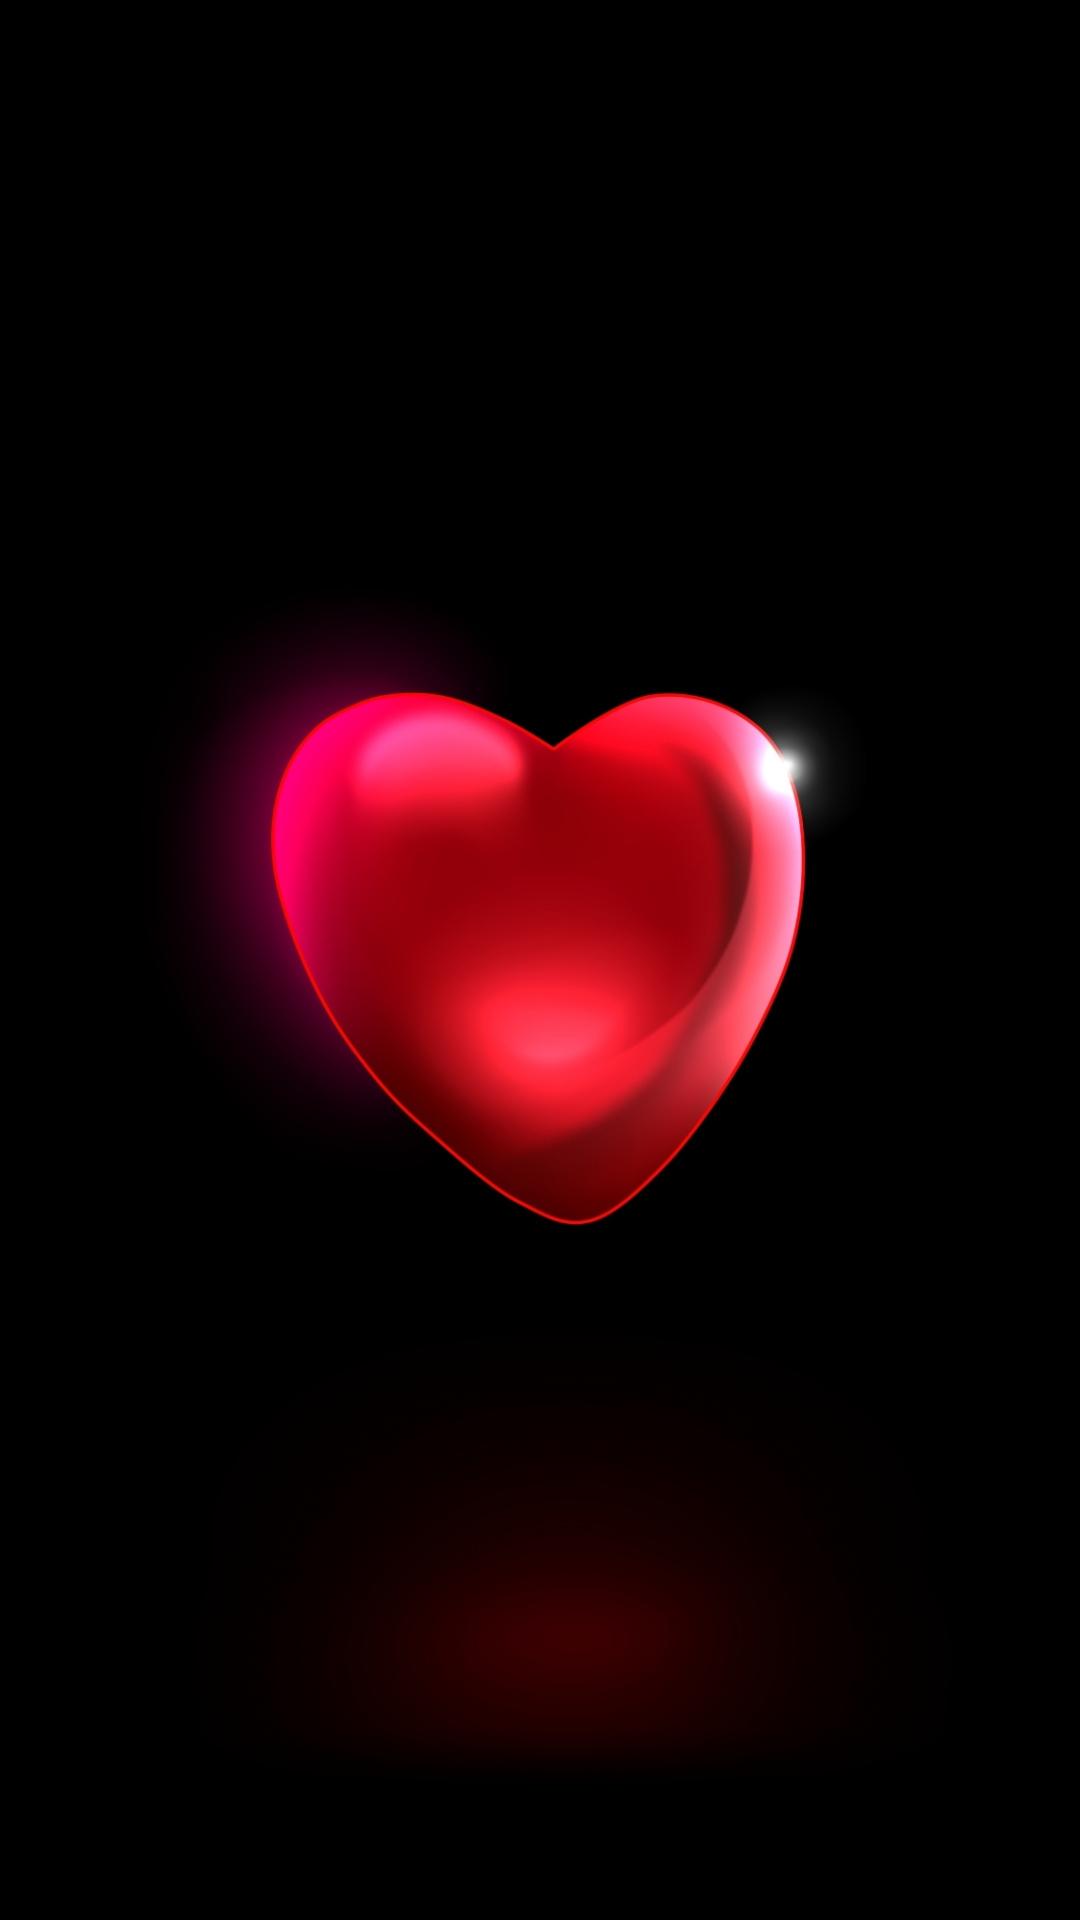 Black Wallpaper With Red Heart 1080x1920 Wallpaper Teahub Io